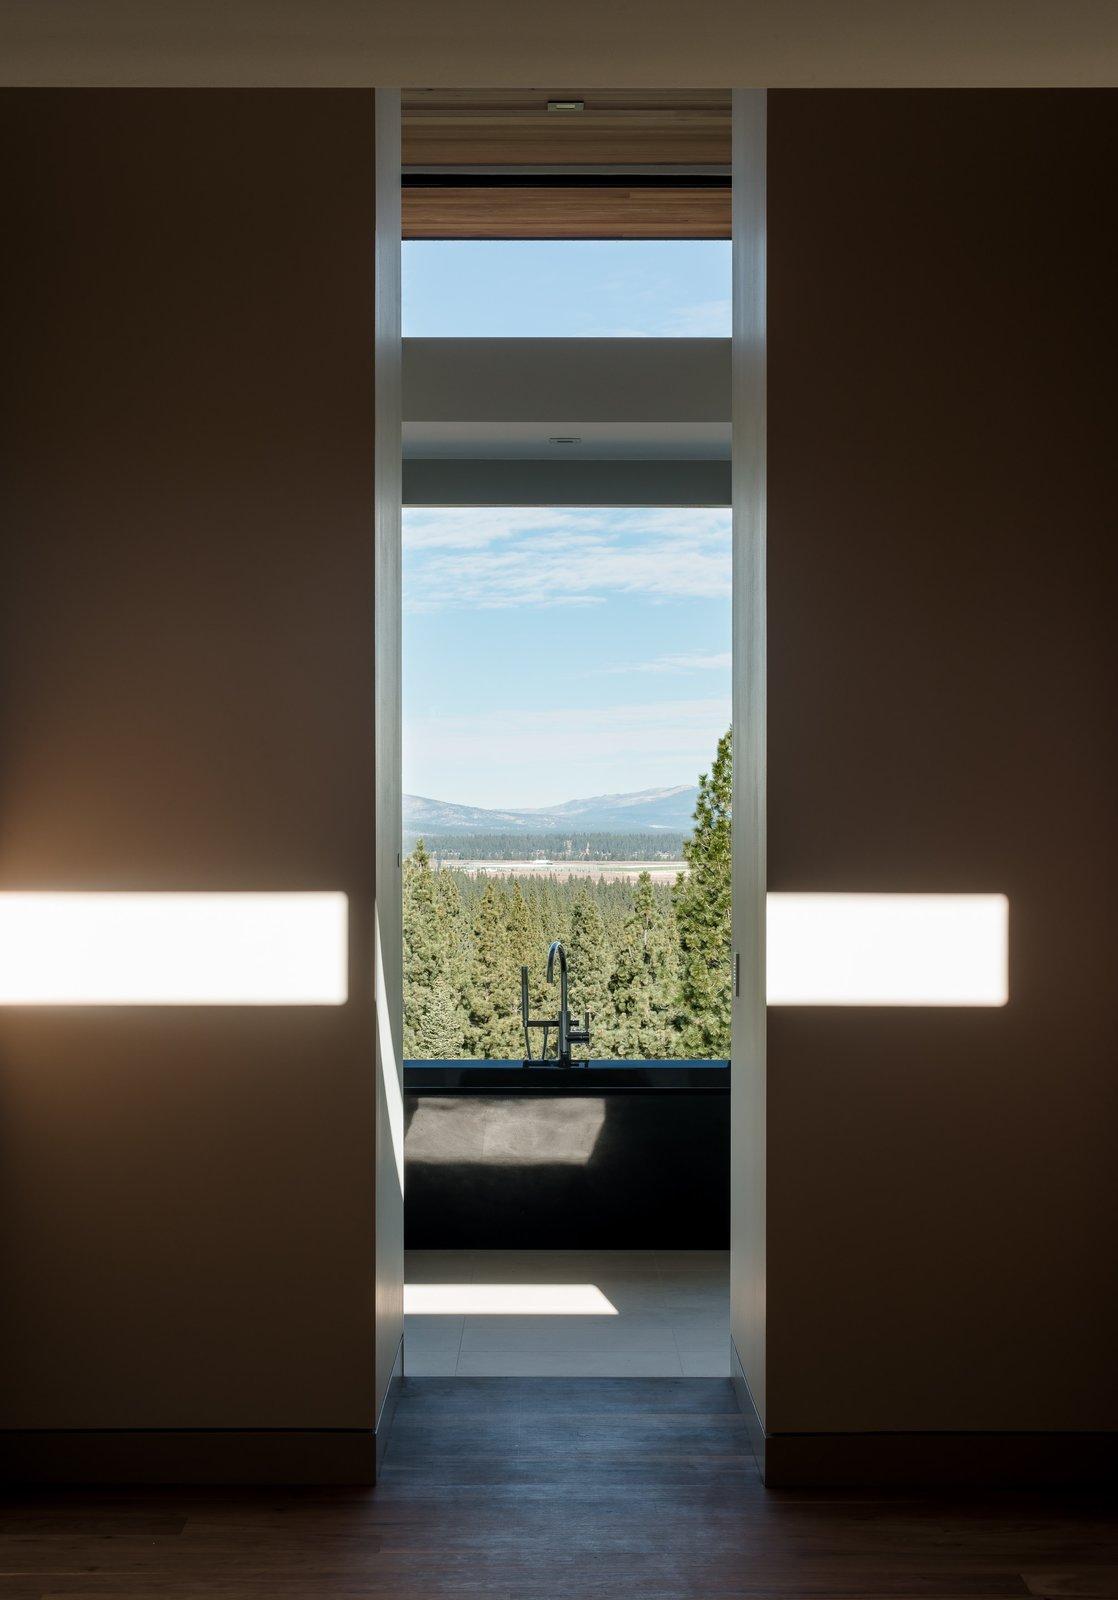 Tagged: Bath Room, Medium Hardwood Floor, Porcelain Tile Floor, and Freestanding Tub.  Martis Camp Residence 2 by John Maniscalco Architecture